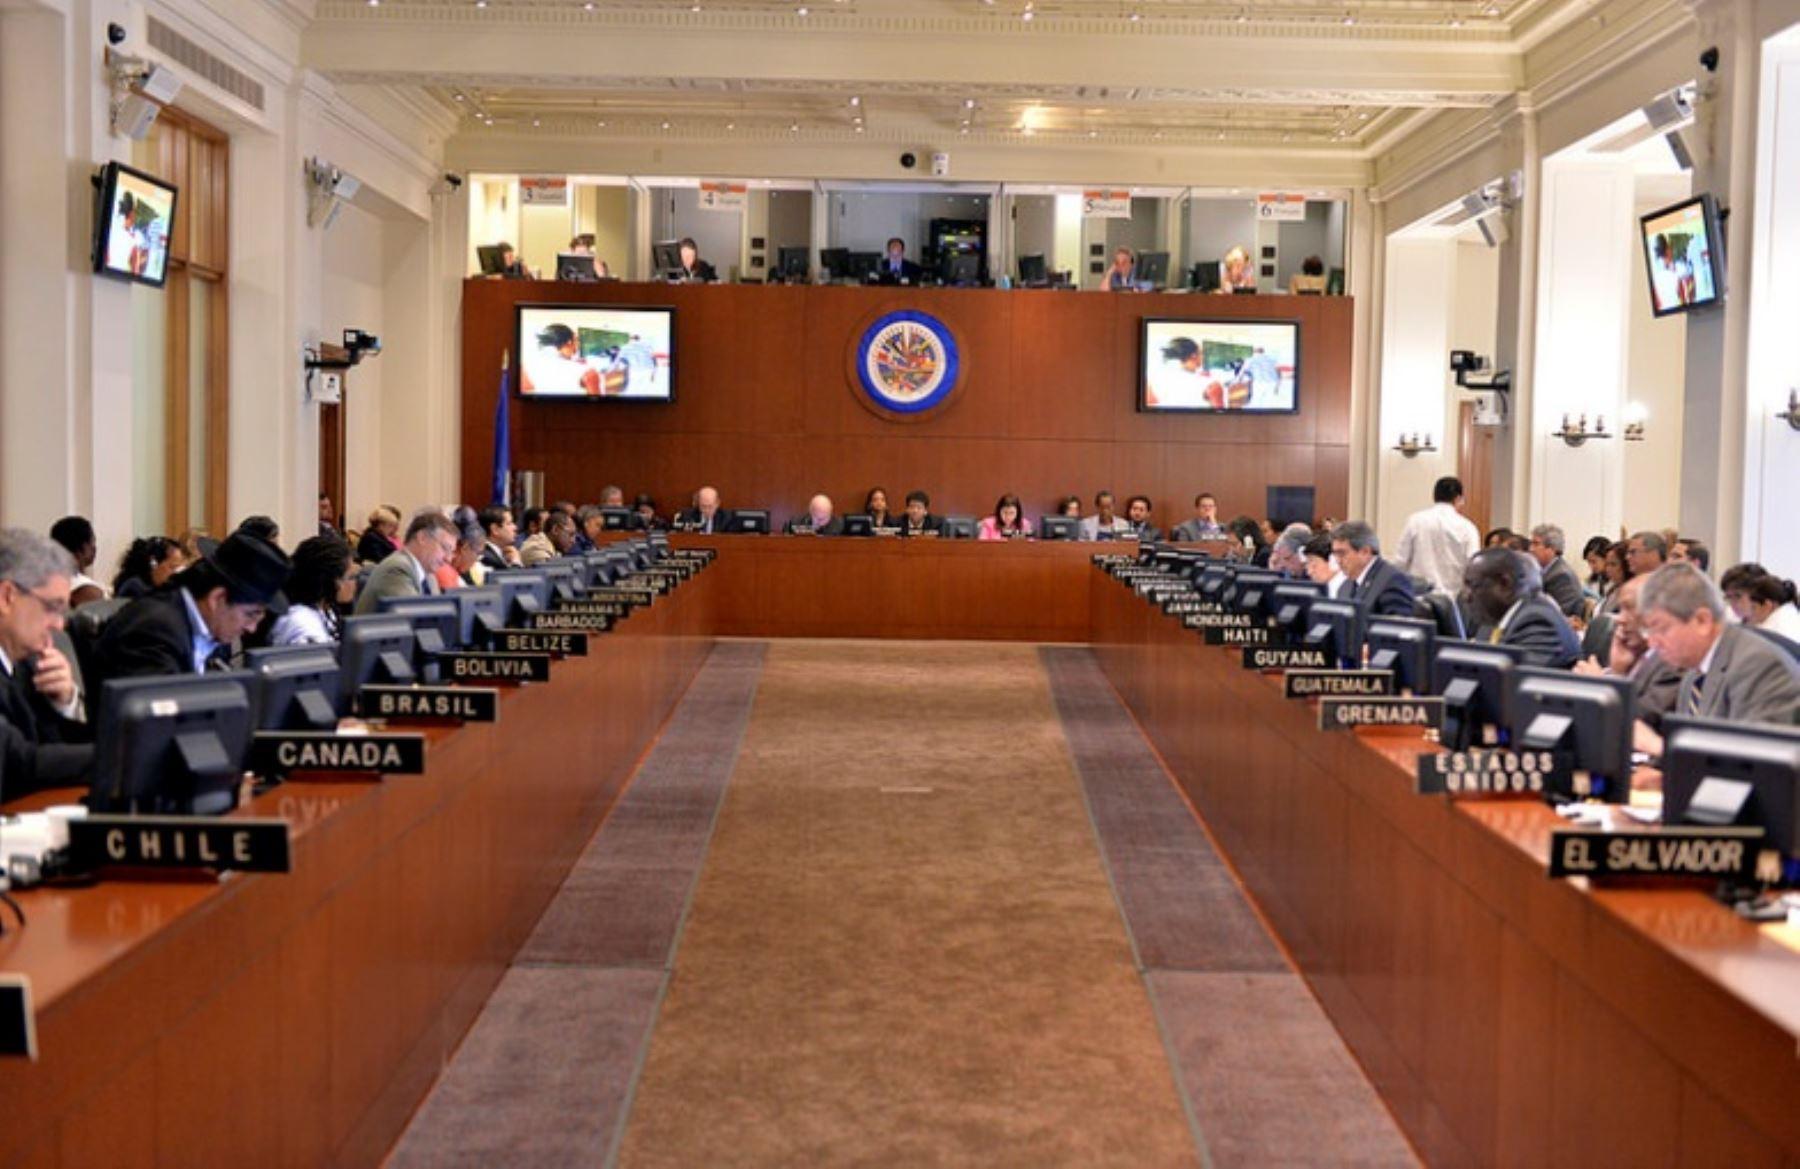 OAS celebrates Qhapaq Ñan inclusion in World Heritage list.